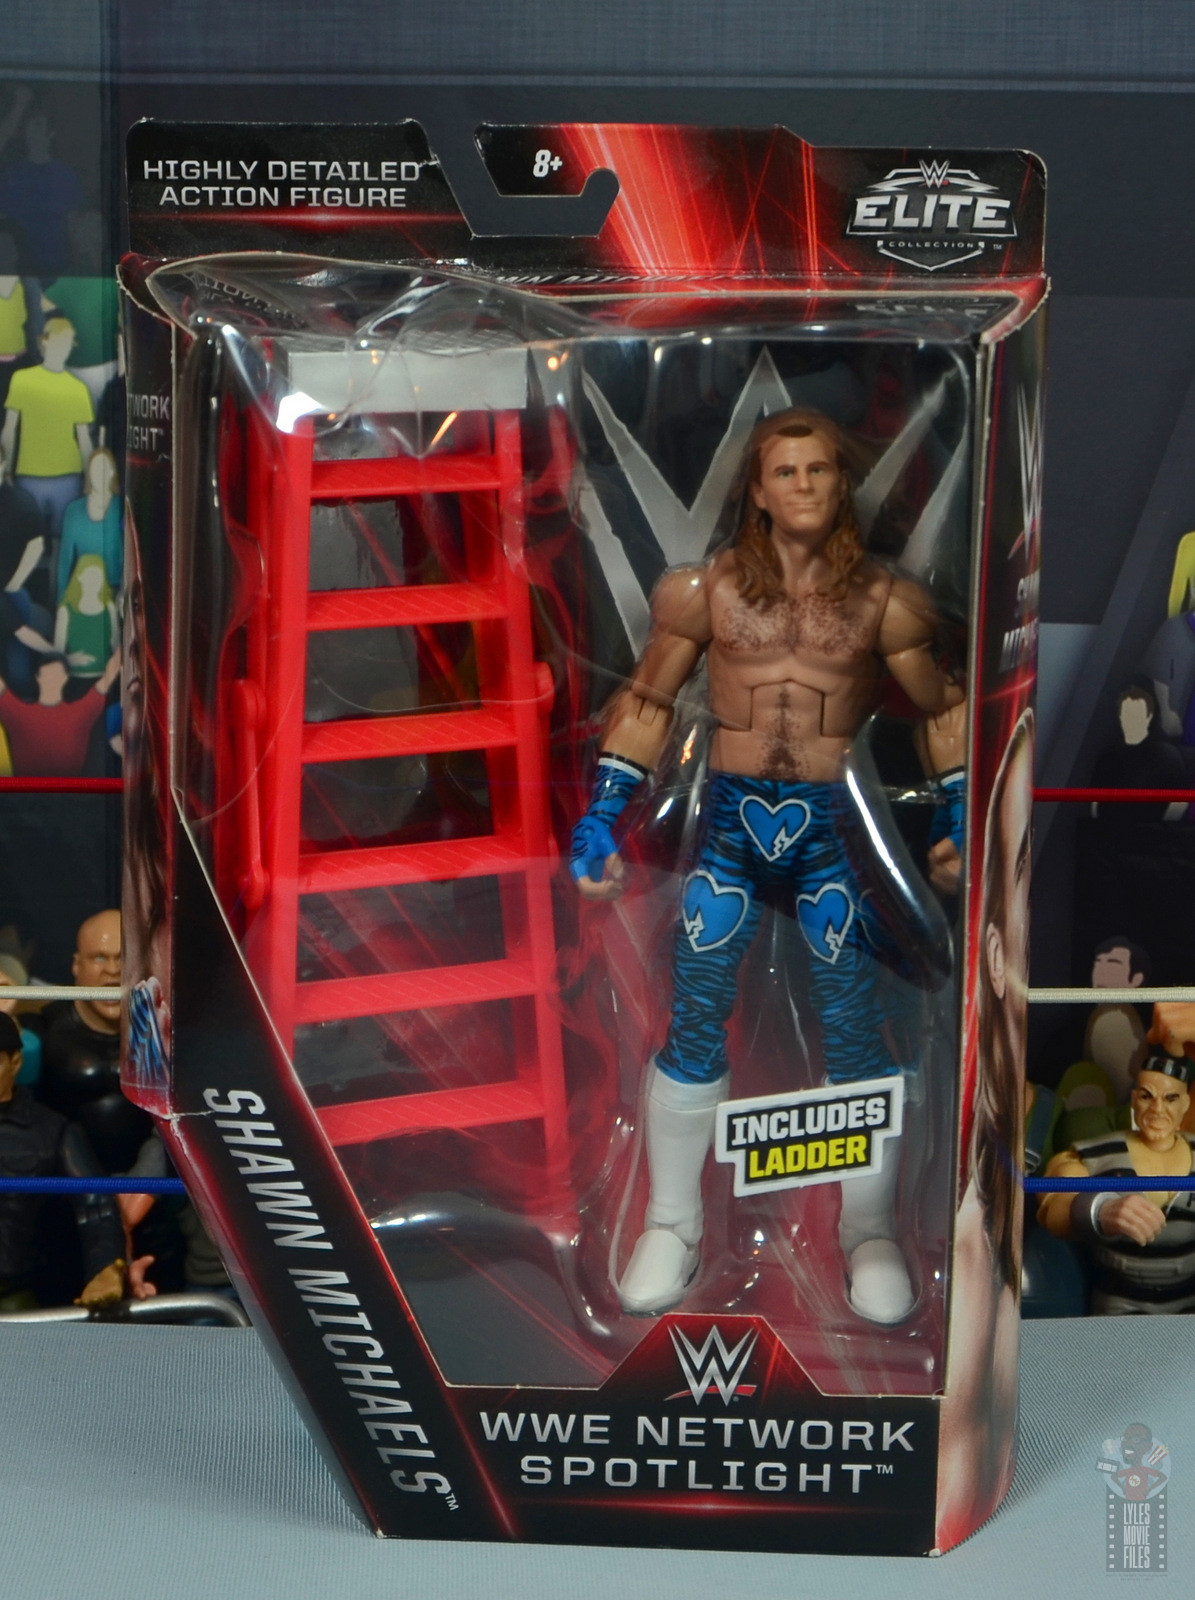 WWE ELITE SHAWN MICHAELS FIGURE EXCLUSIVE NETWORK SPOTLIGHT HBK SUMMERSLAM 95